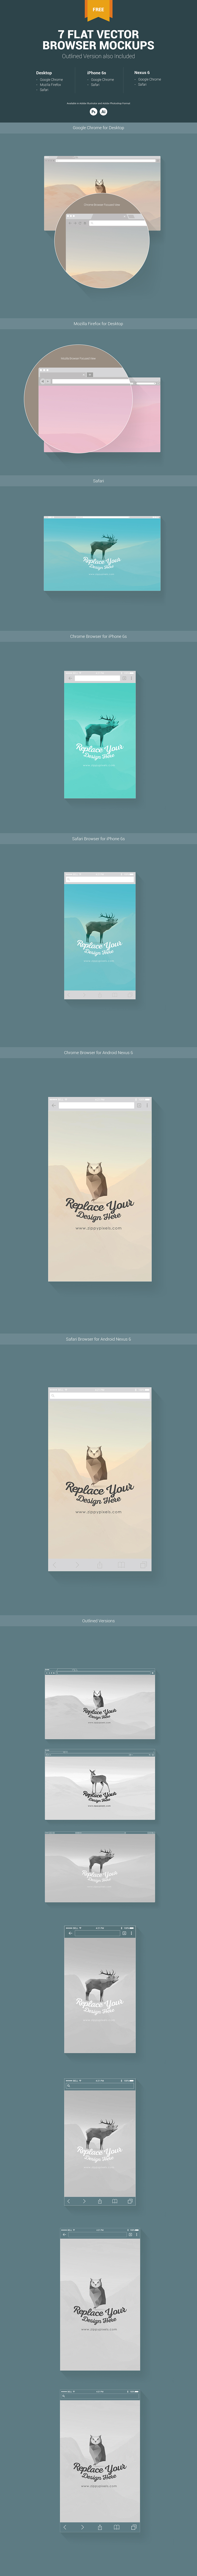 7 Free Vector Web & Mobile Browser Mockups